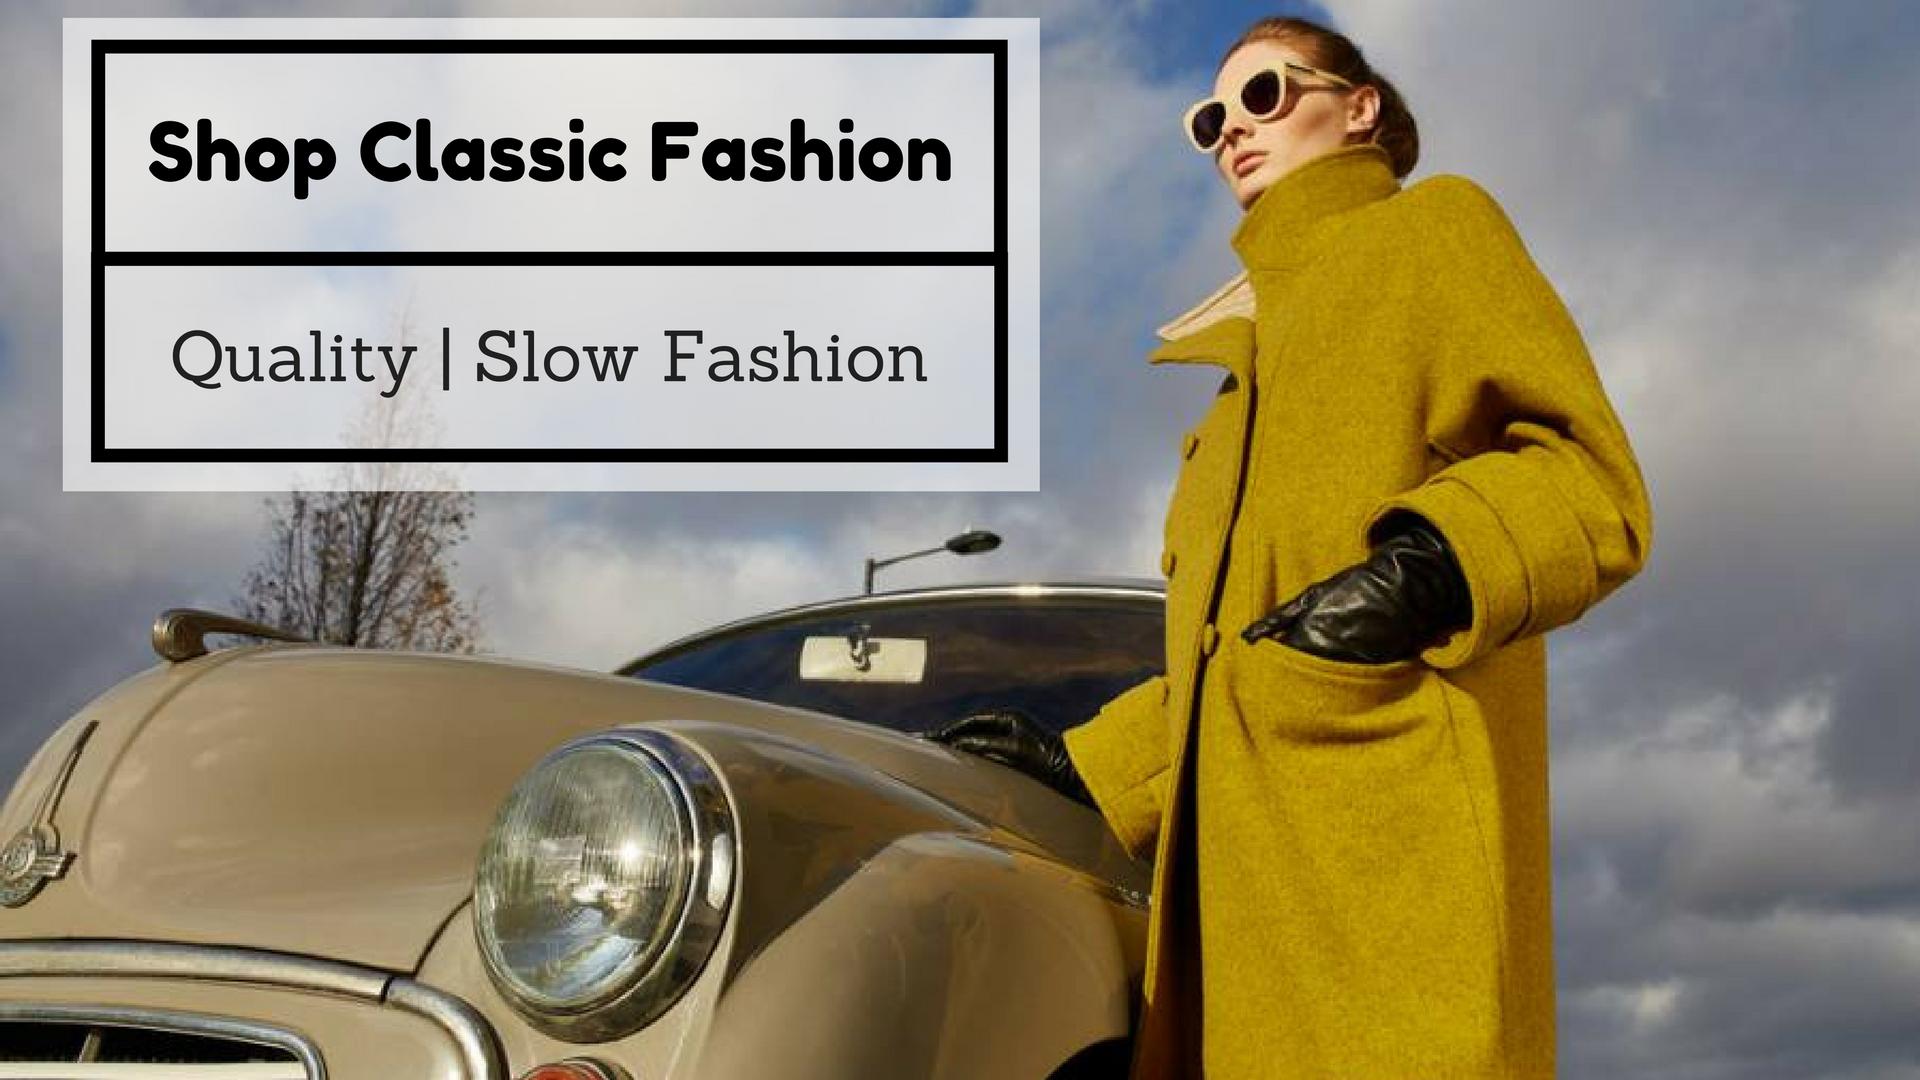 shop classic fashion charlotte zimbehl facebook image.png